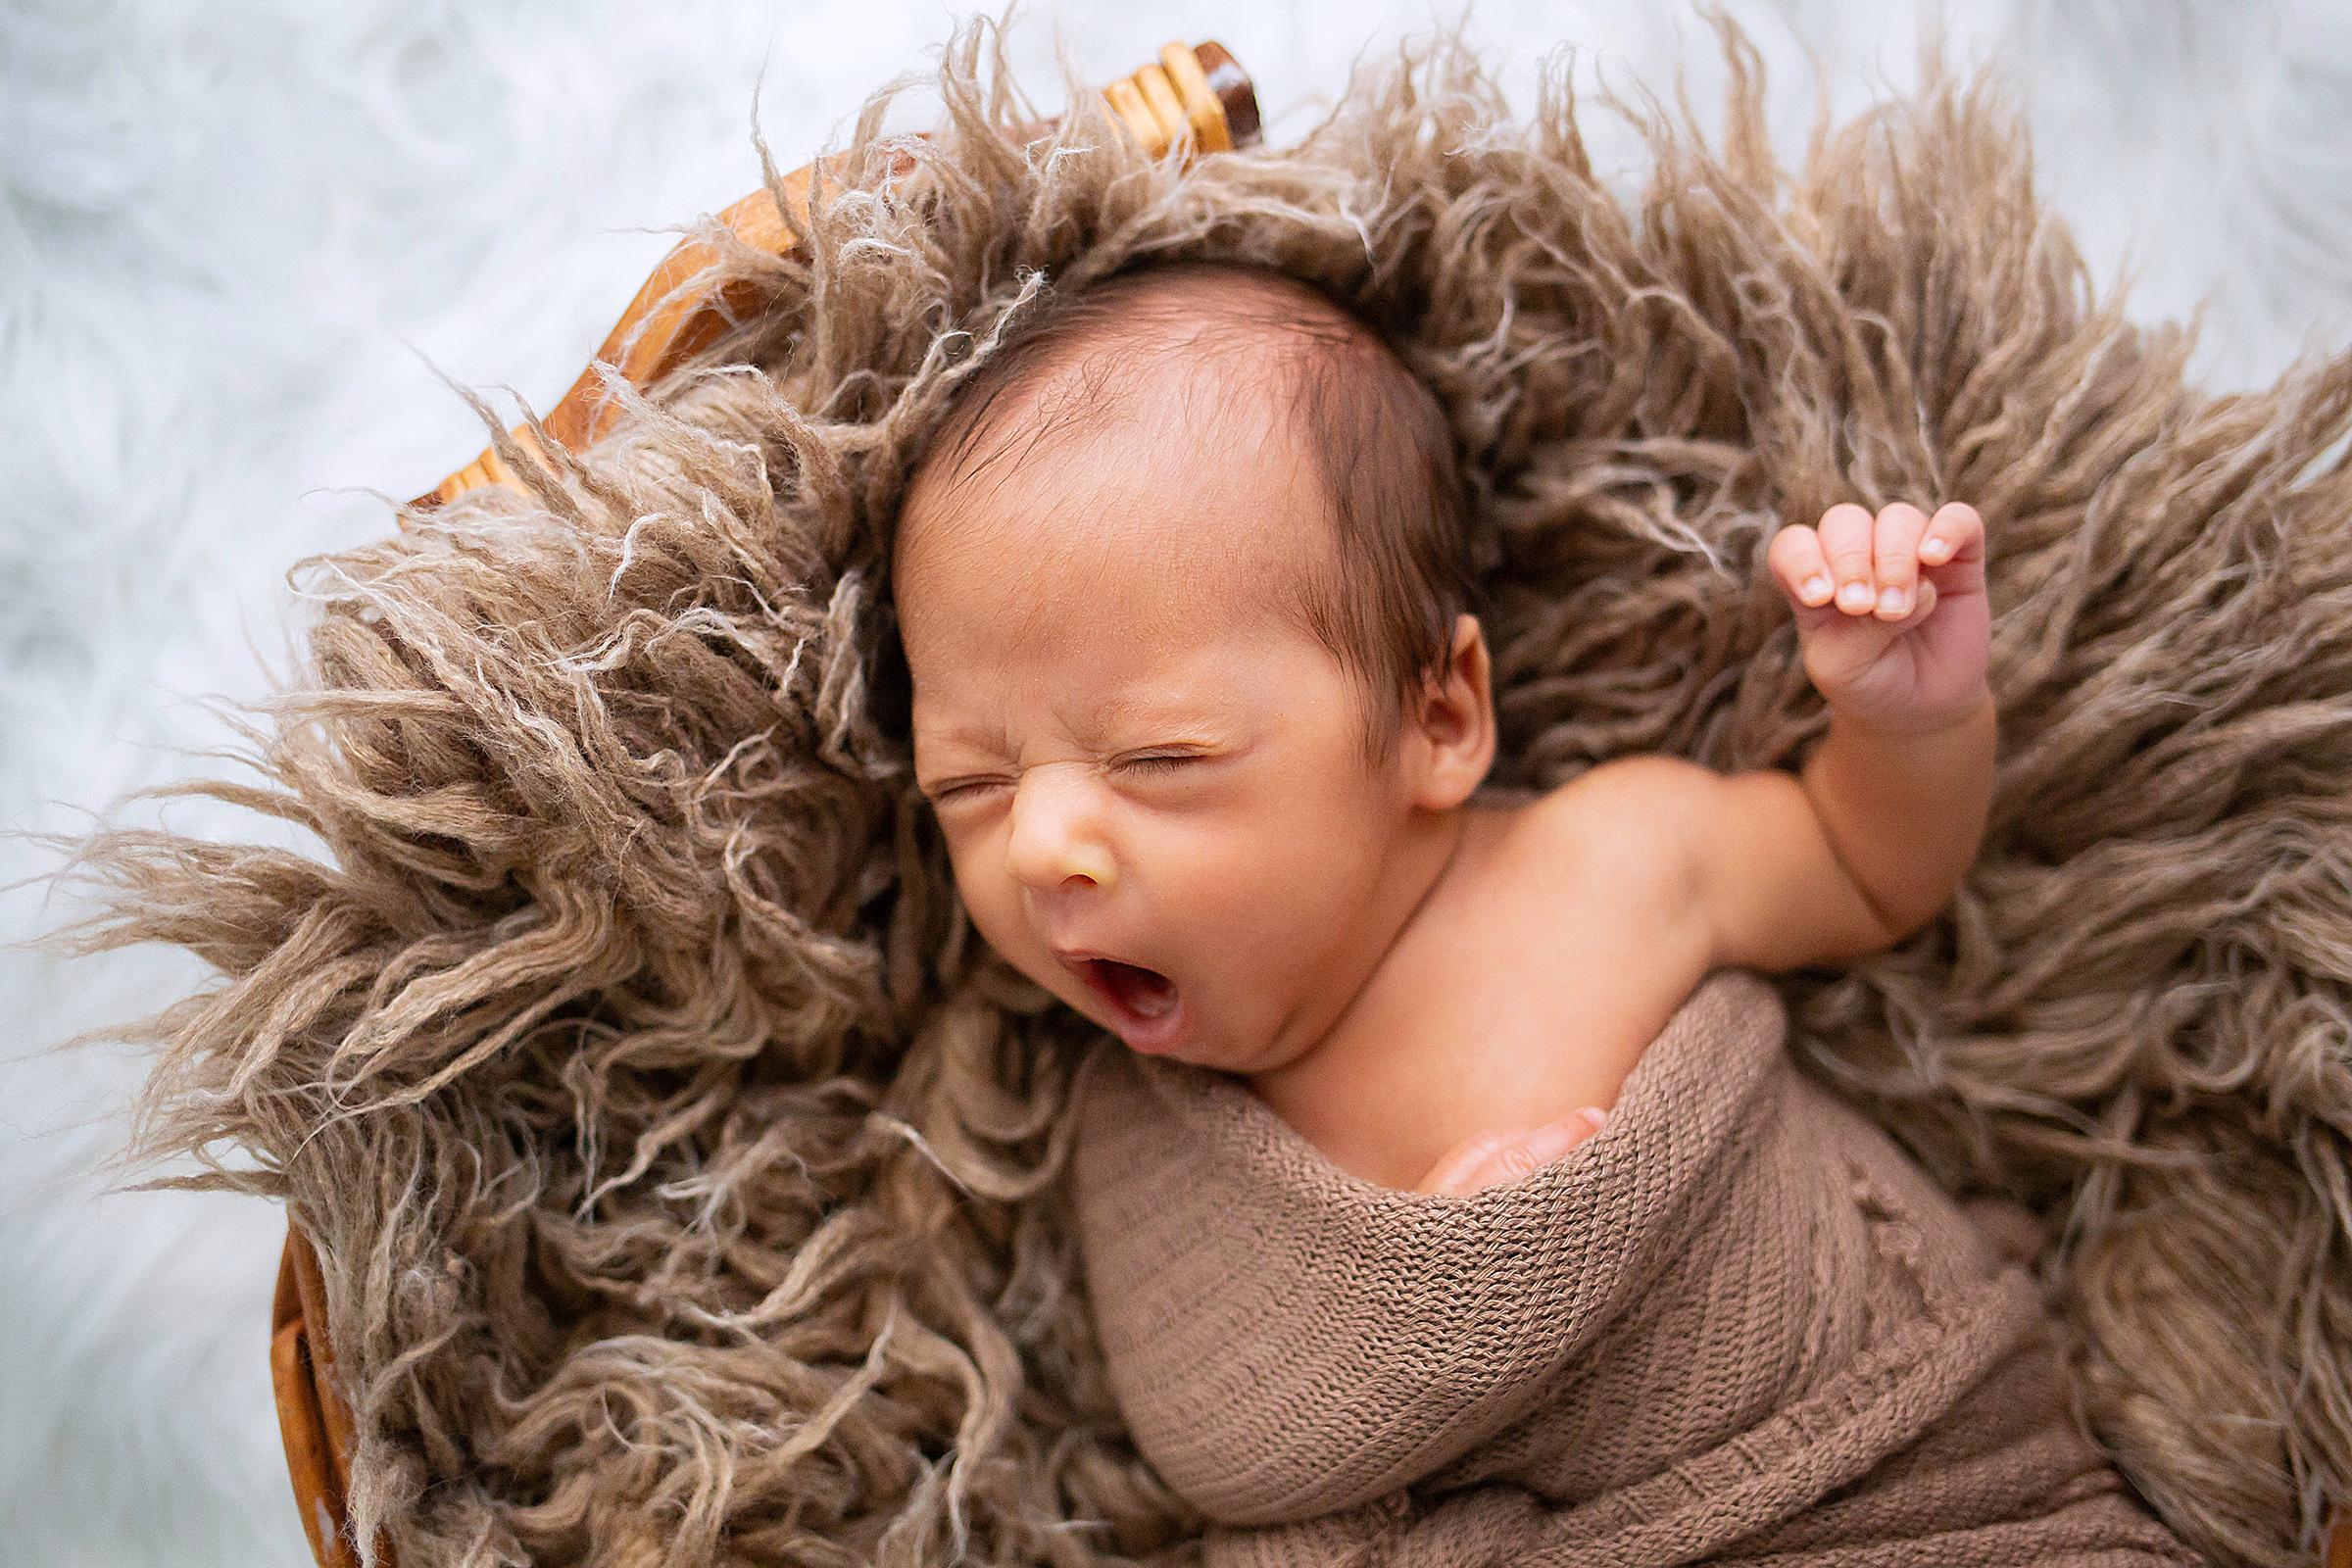 mount-dora-newborn-photographer.jpg